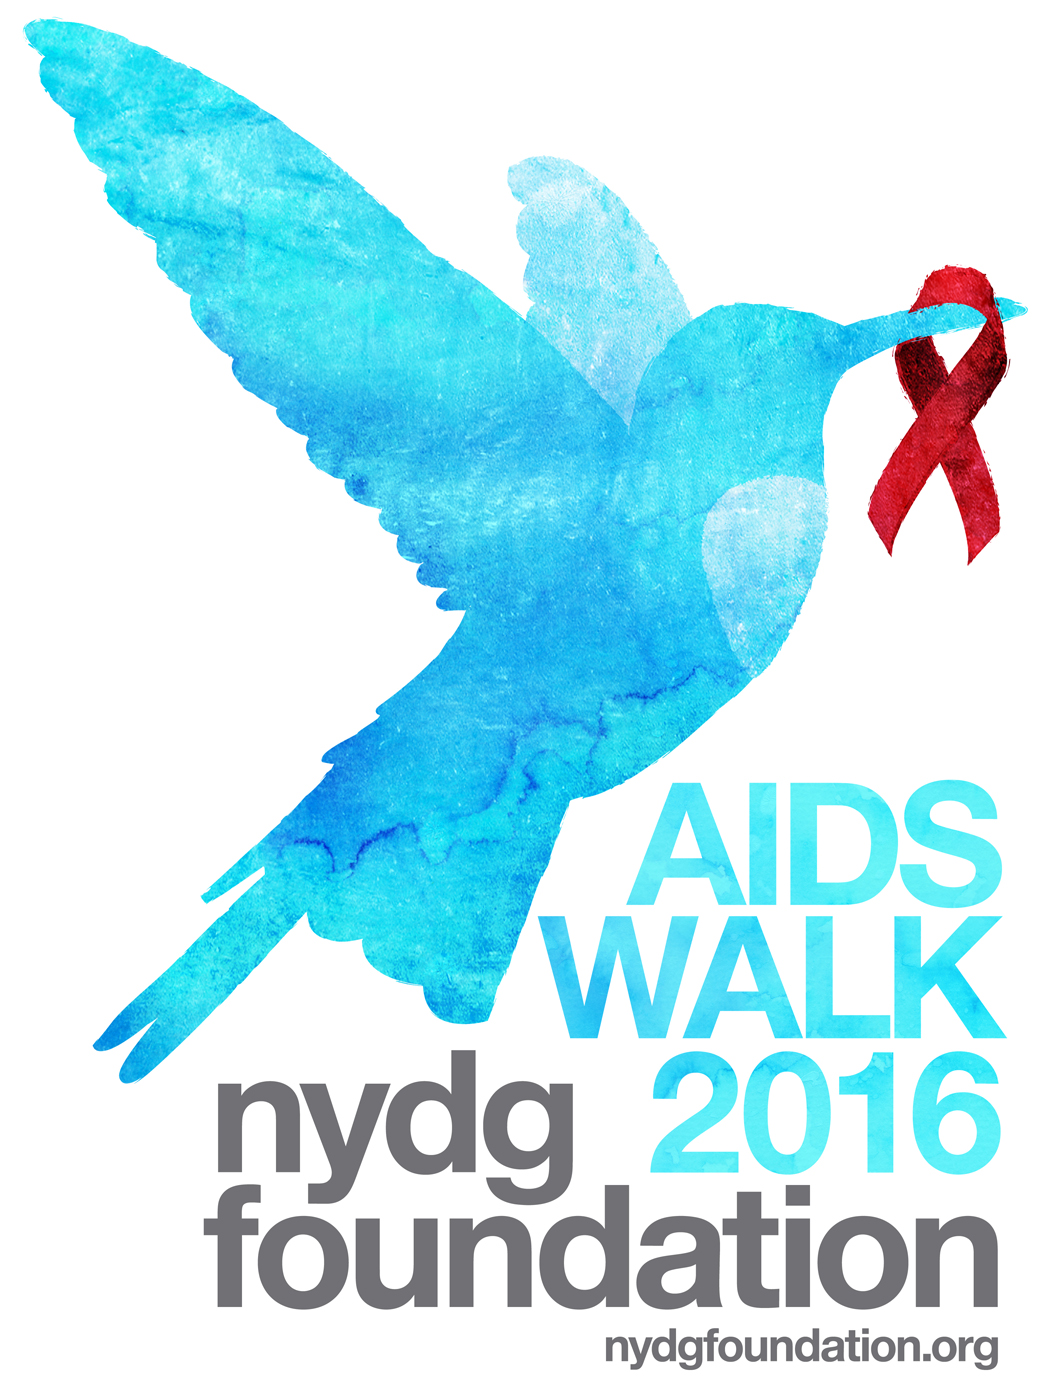 NYDGF_AidsWalk2016_Graphic.jpg